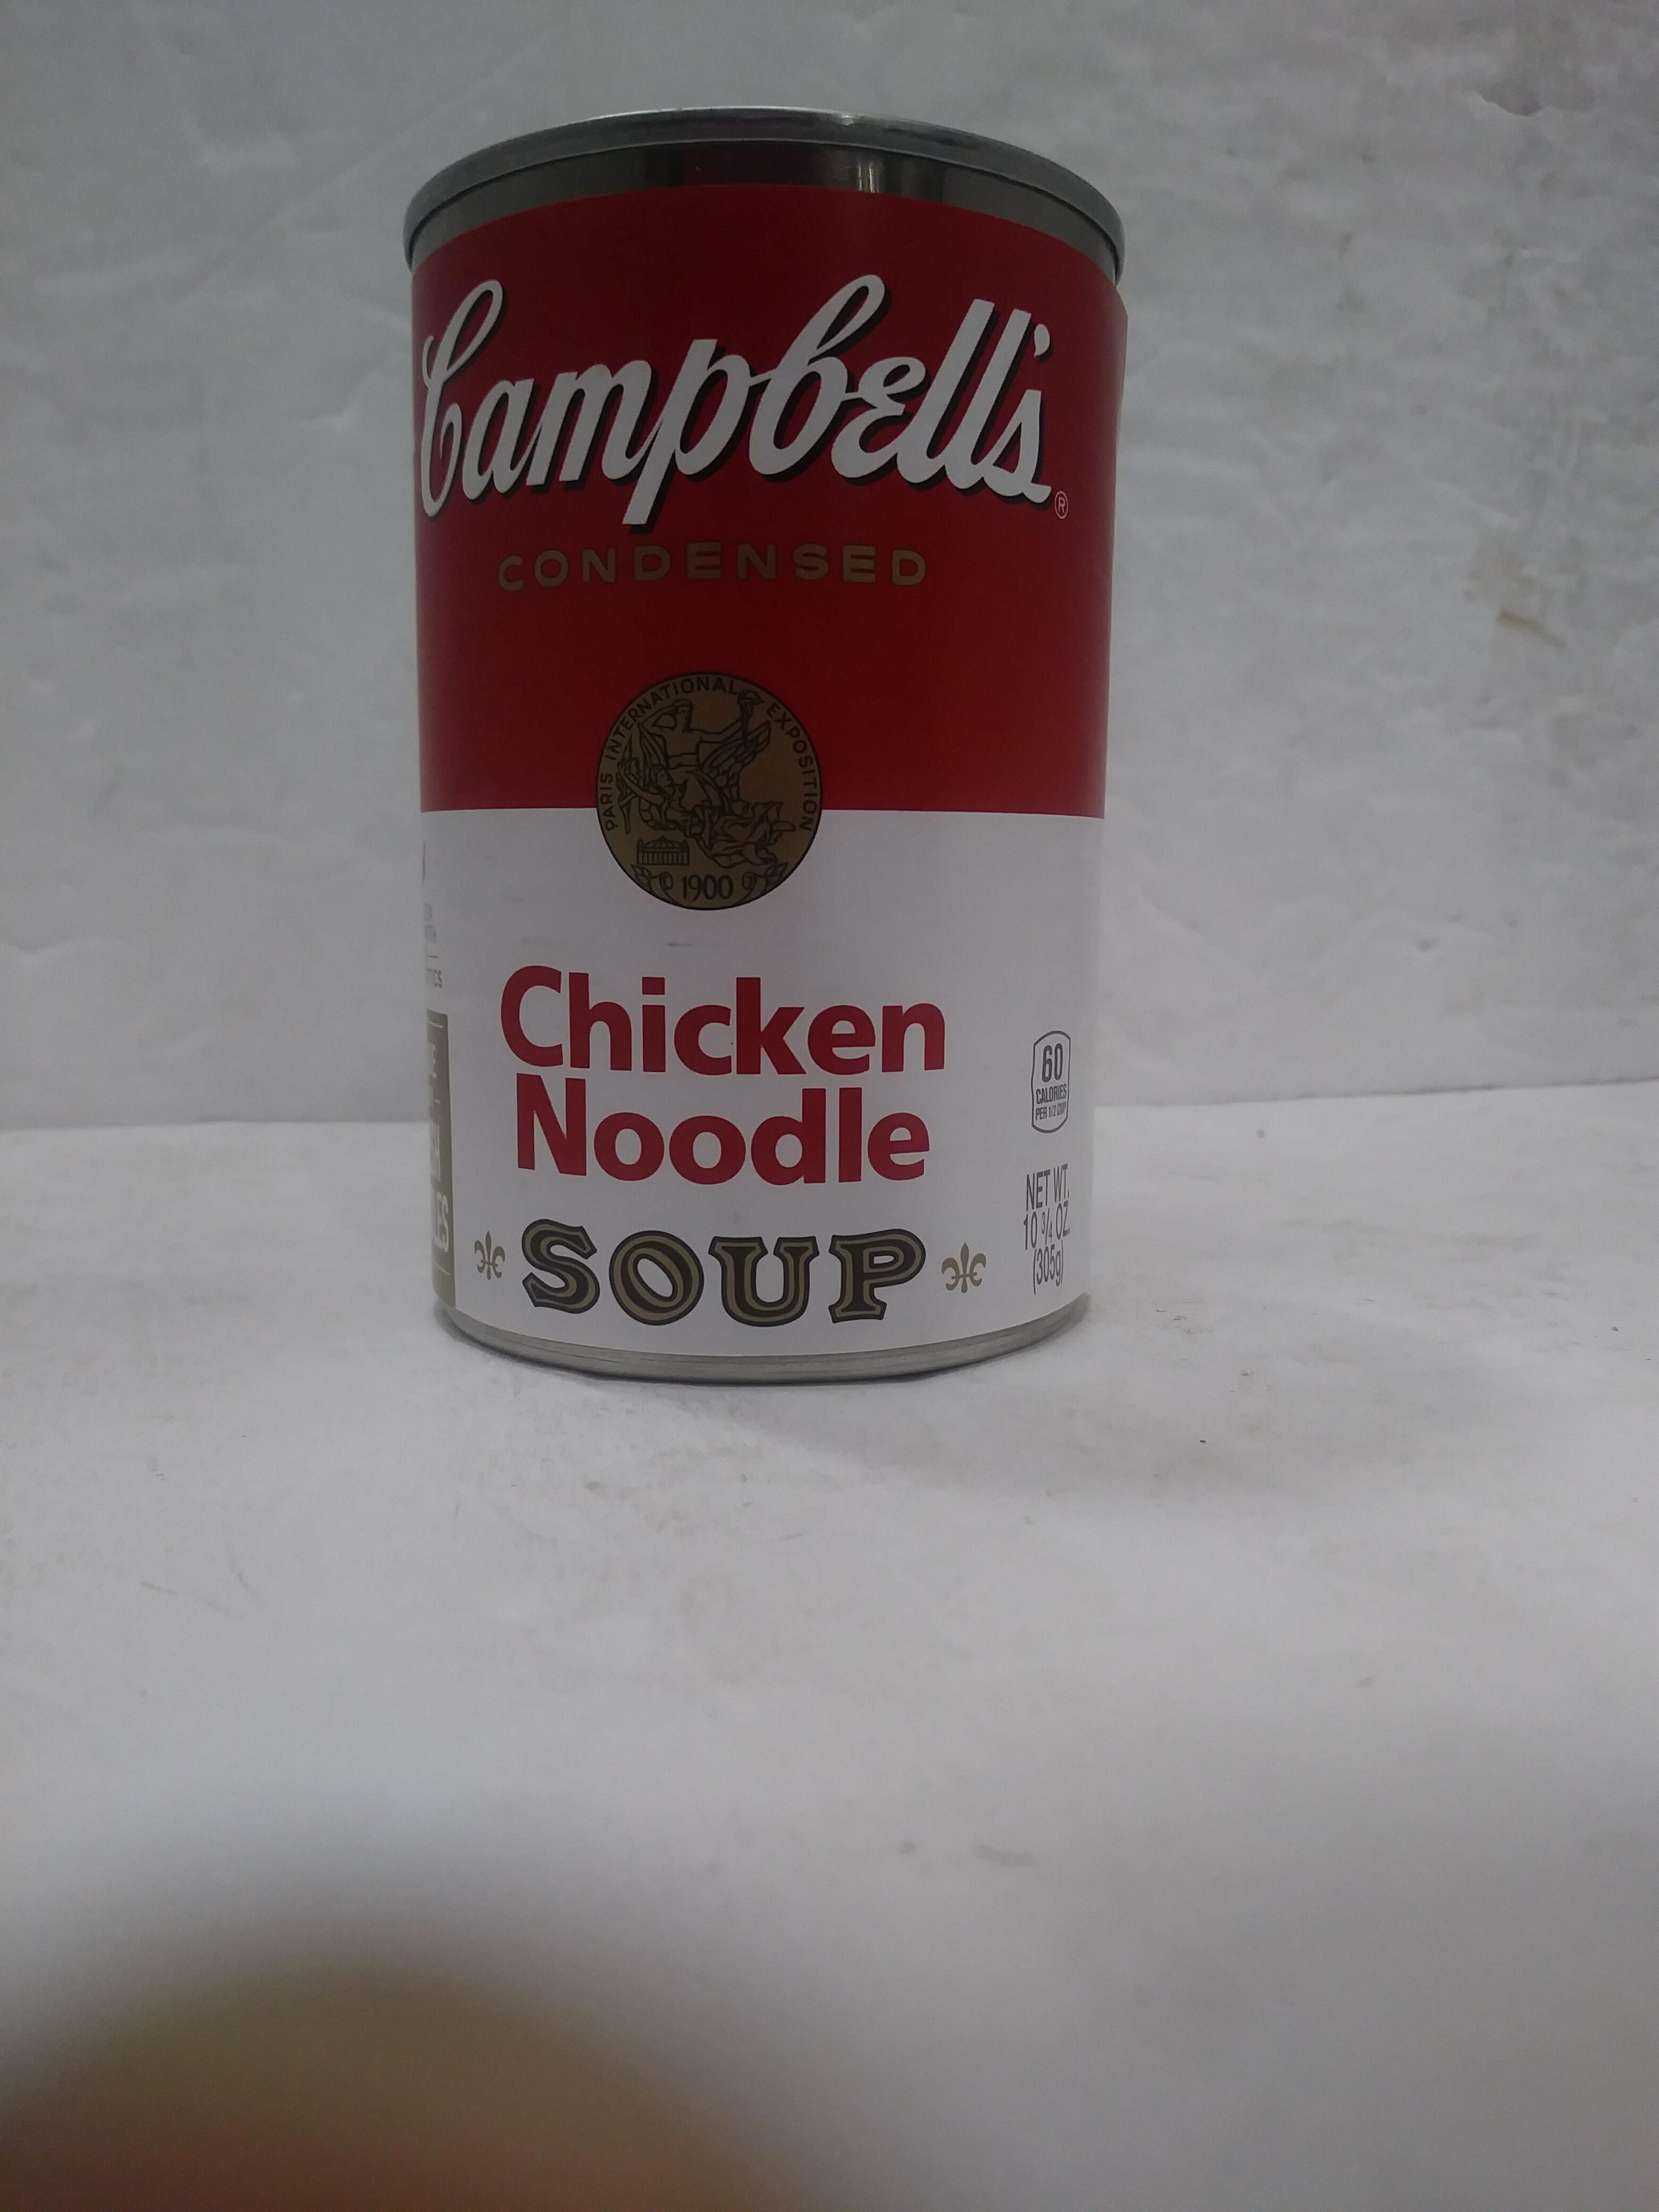 Condensed Chicken Noodle Soup - Product - en